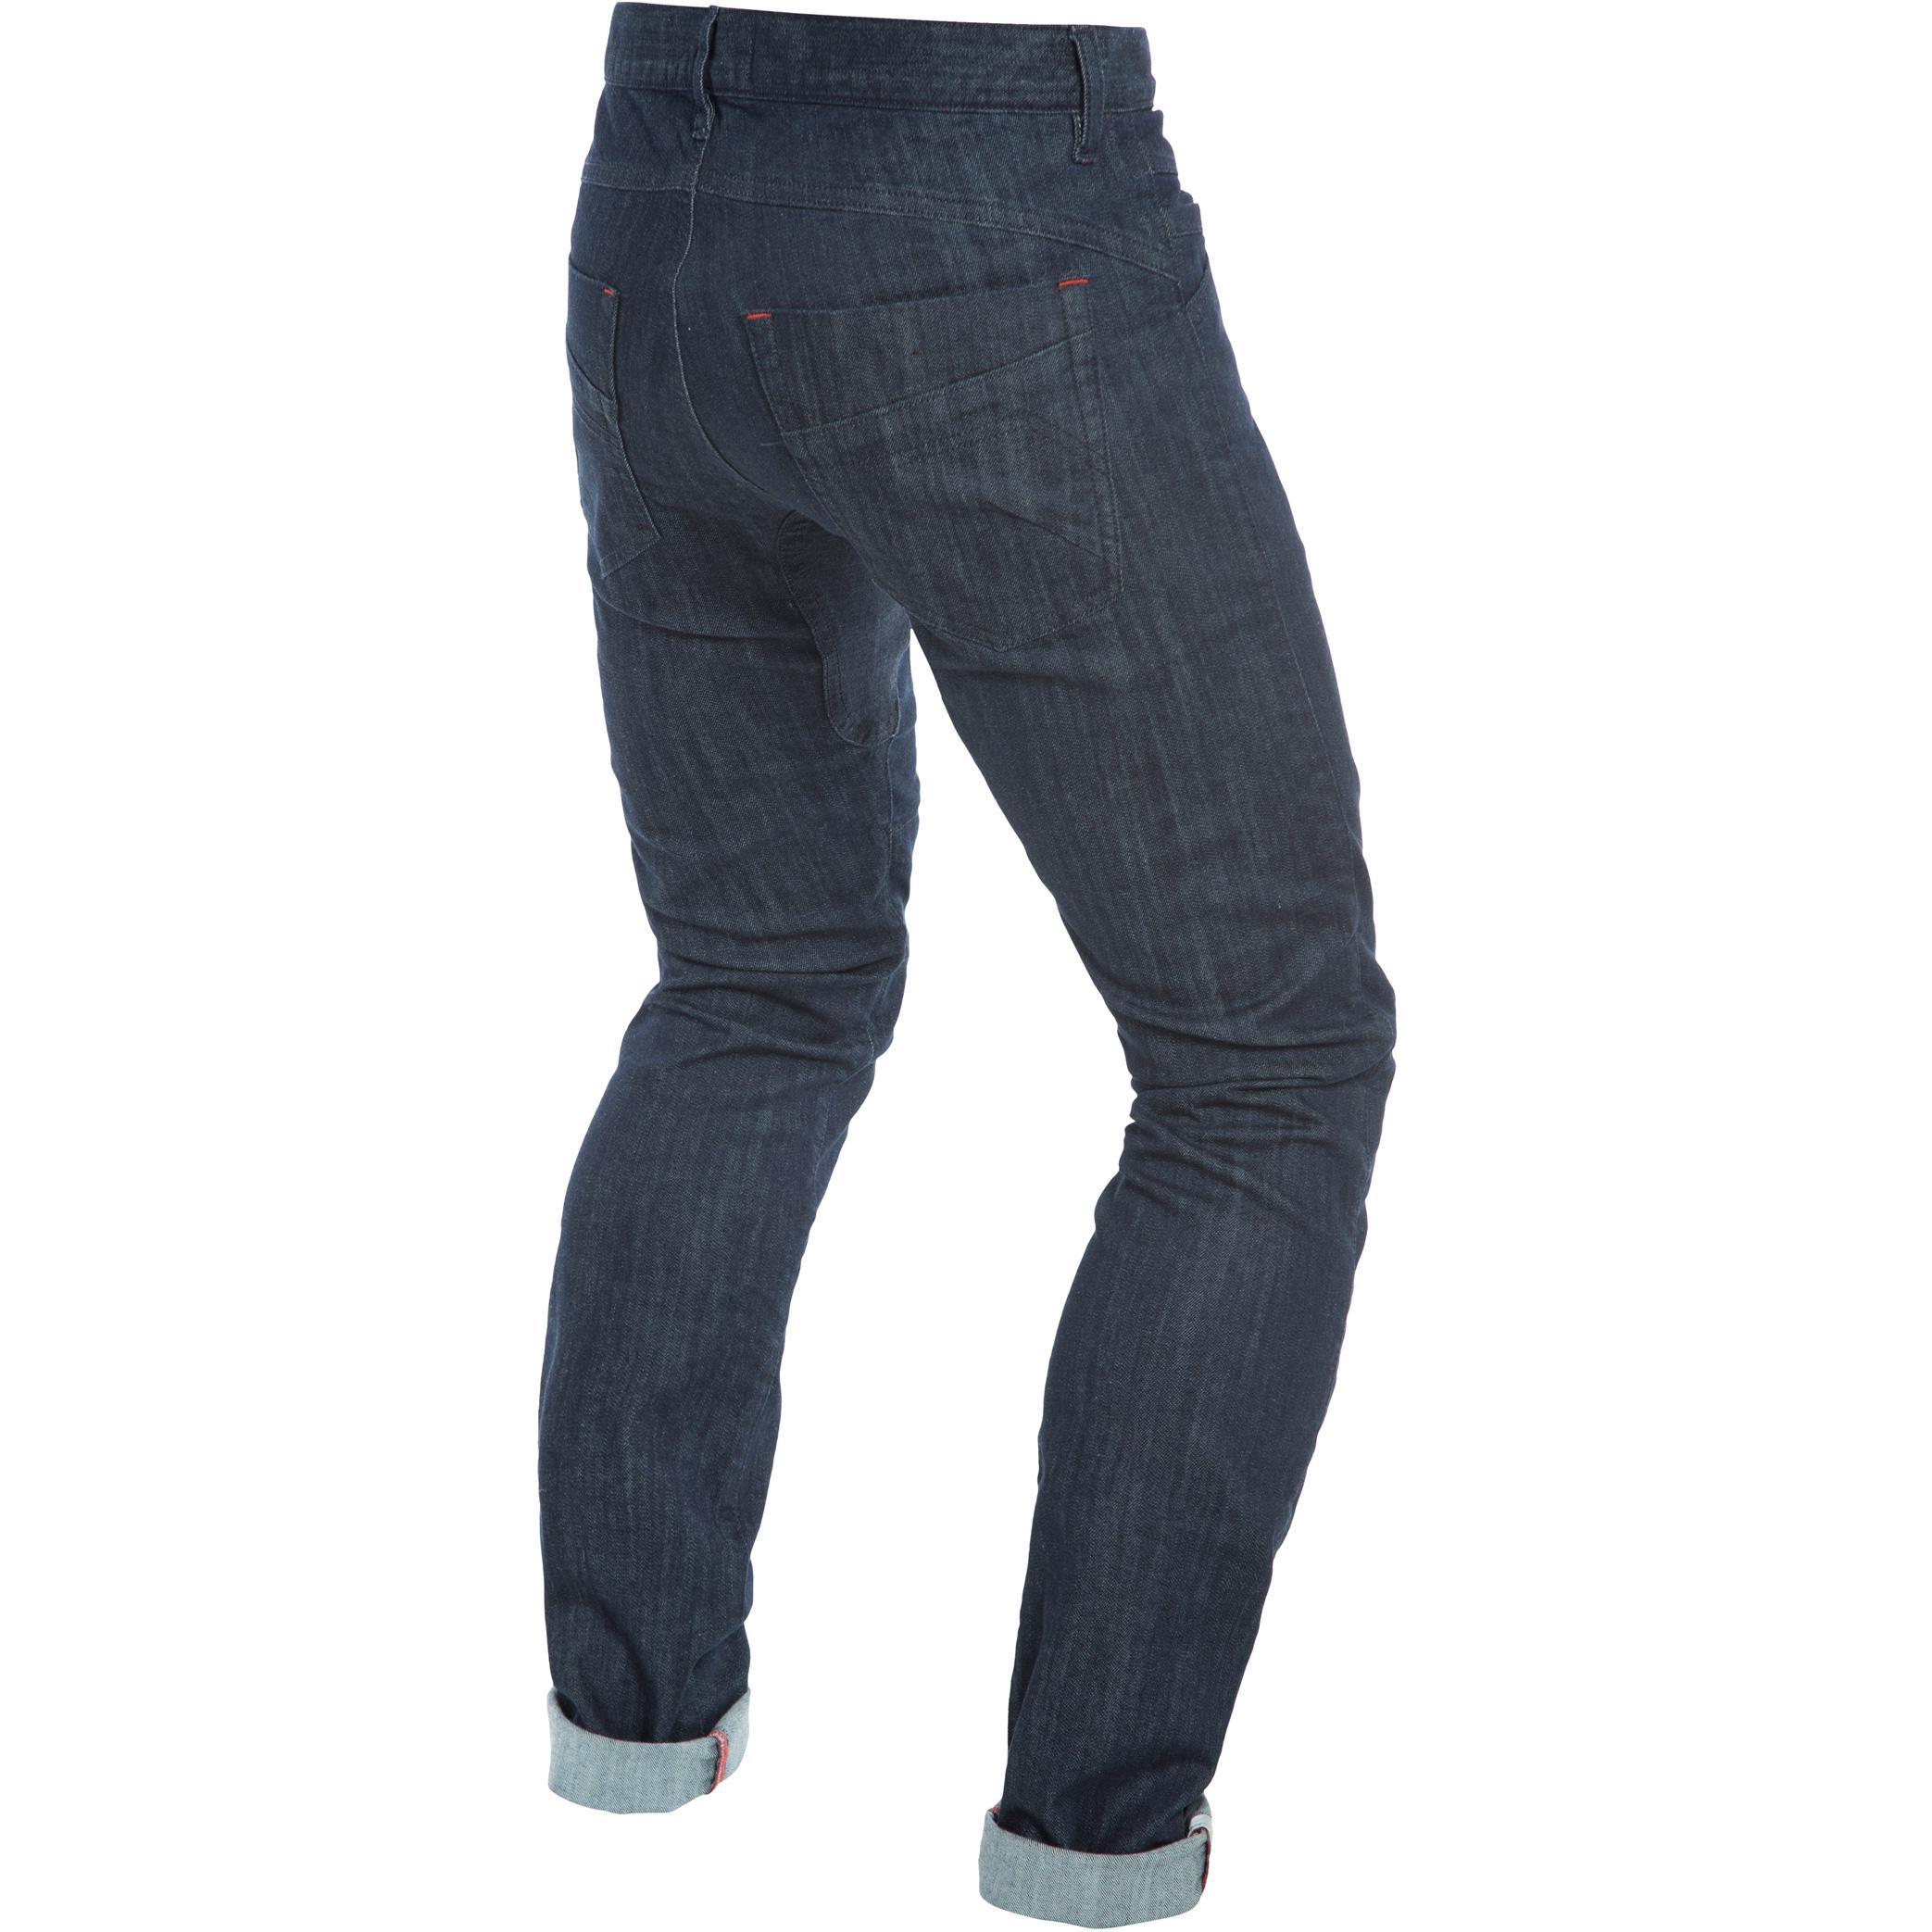 DAINESE-jeans-trento-slim-image-10938962